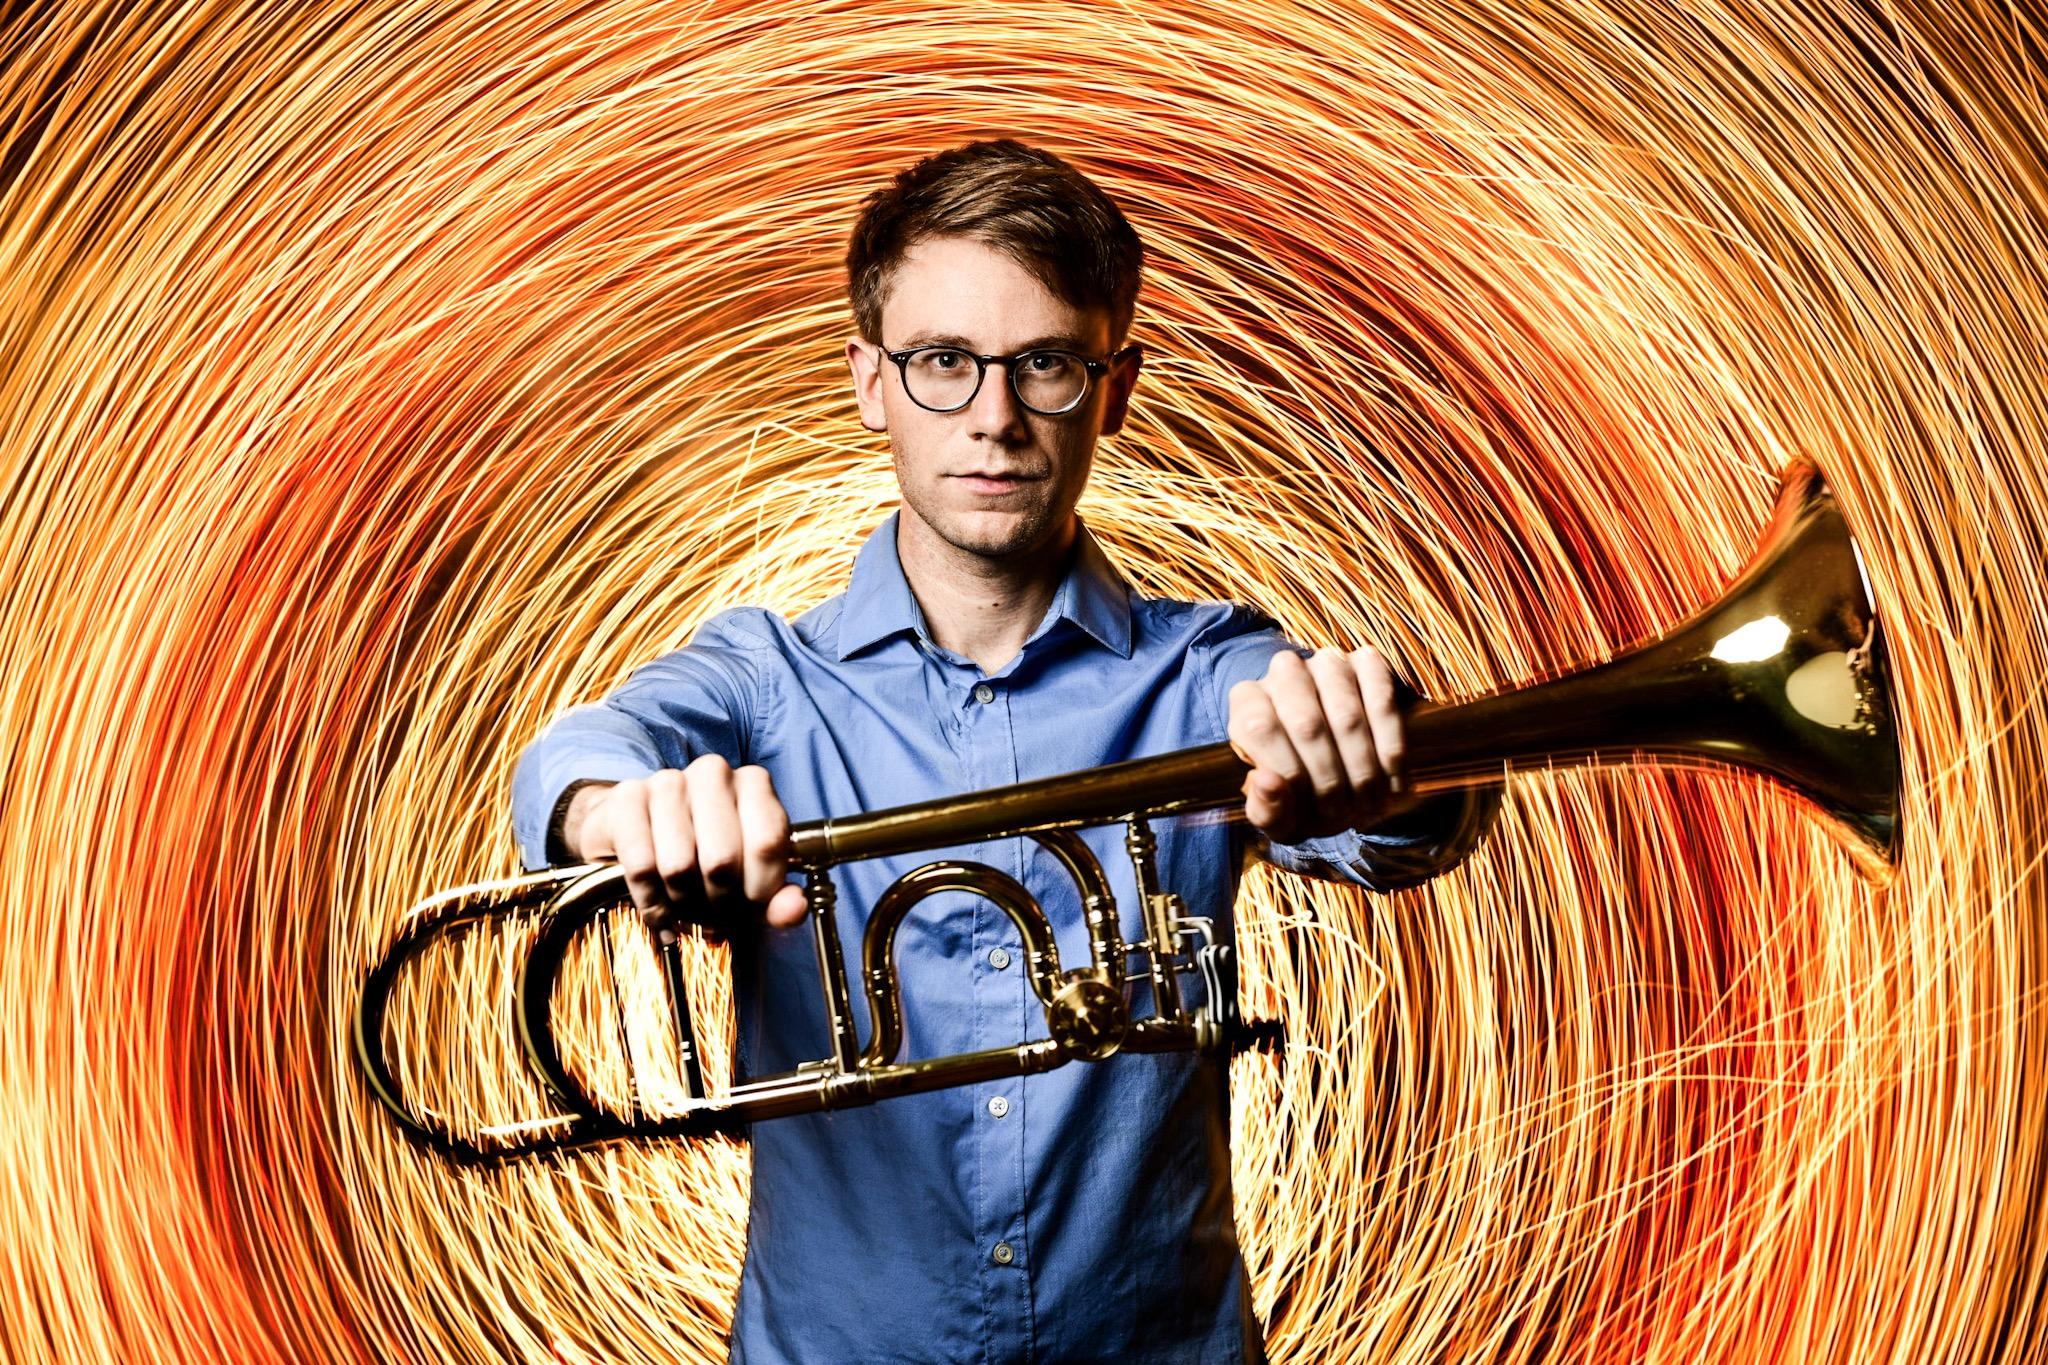 Ian_Striedter_Streidter_Trombone.jpg